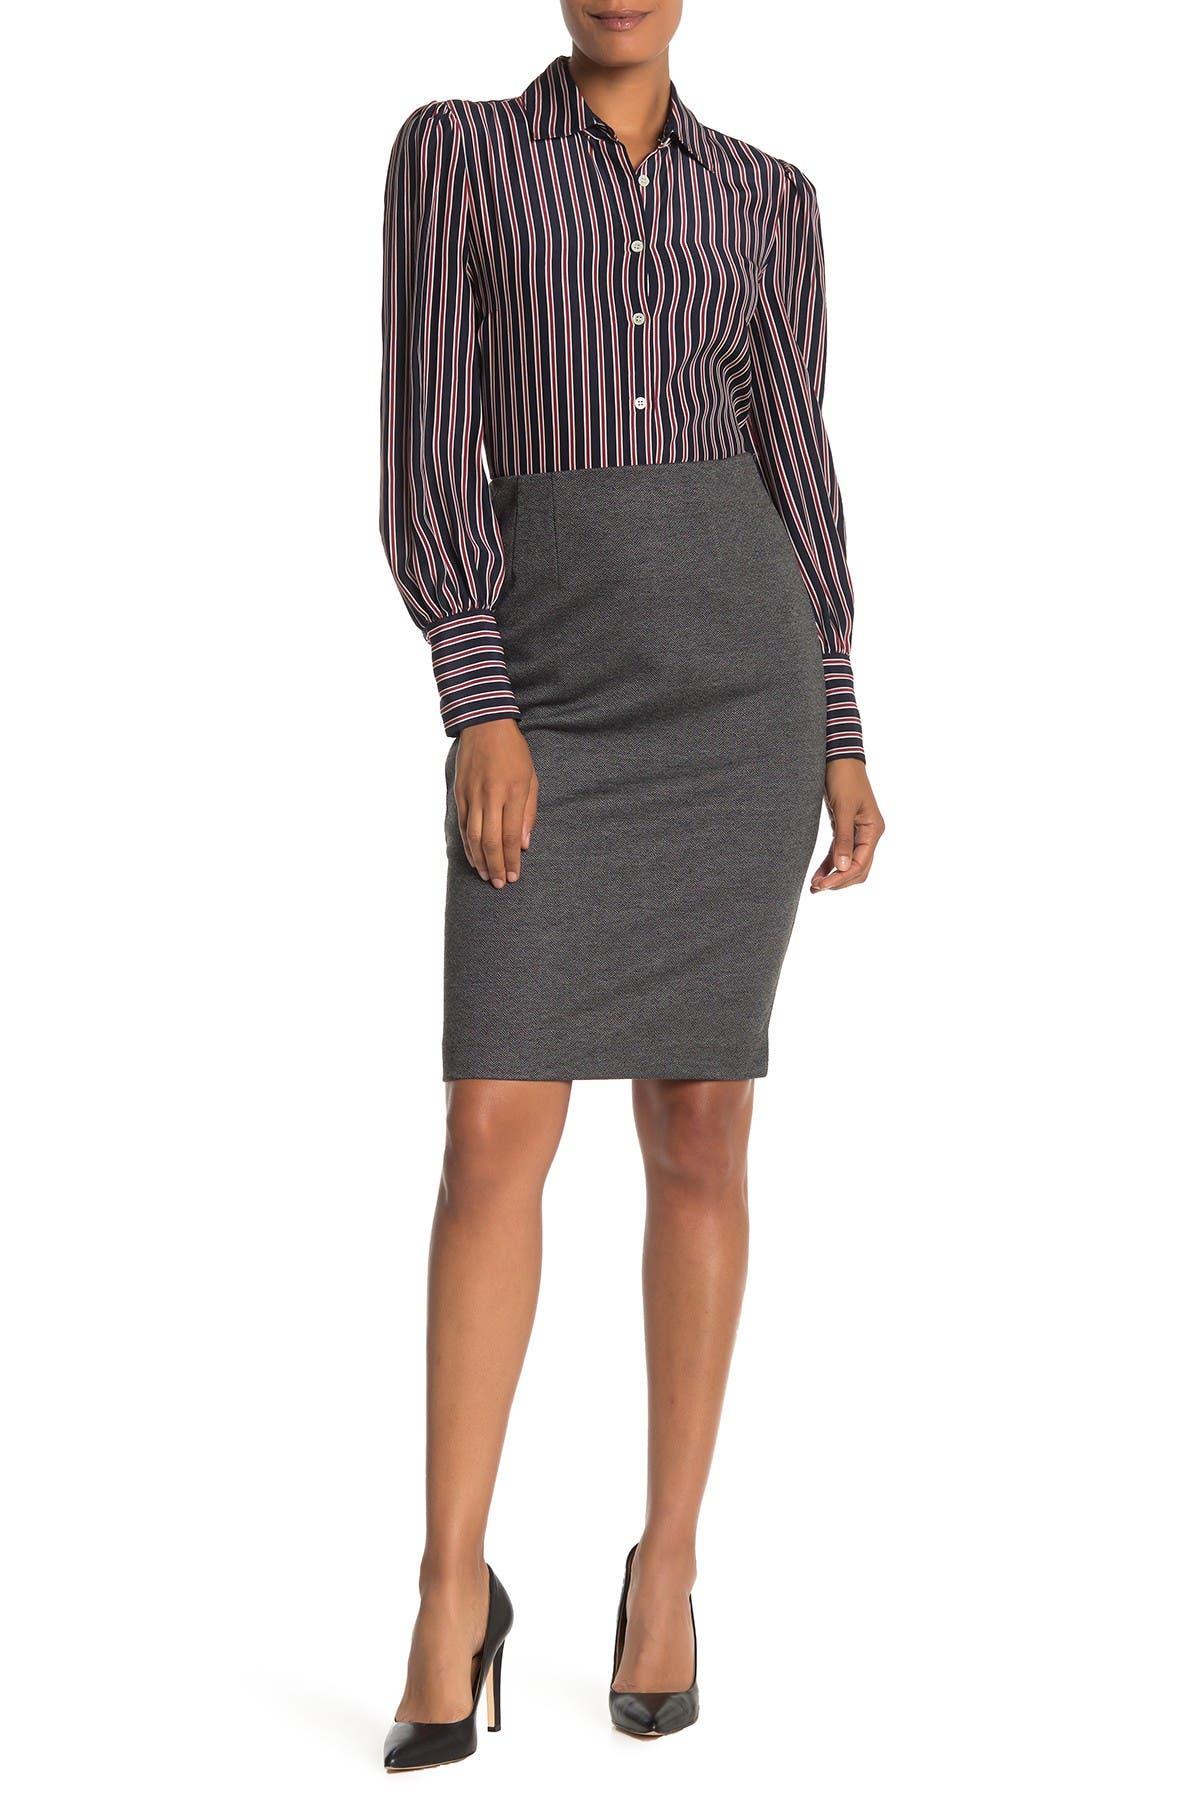 Image of Amanda & Chelsea Herringbone Pull-On Ponte Pencil Skirt